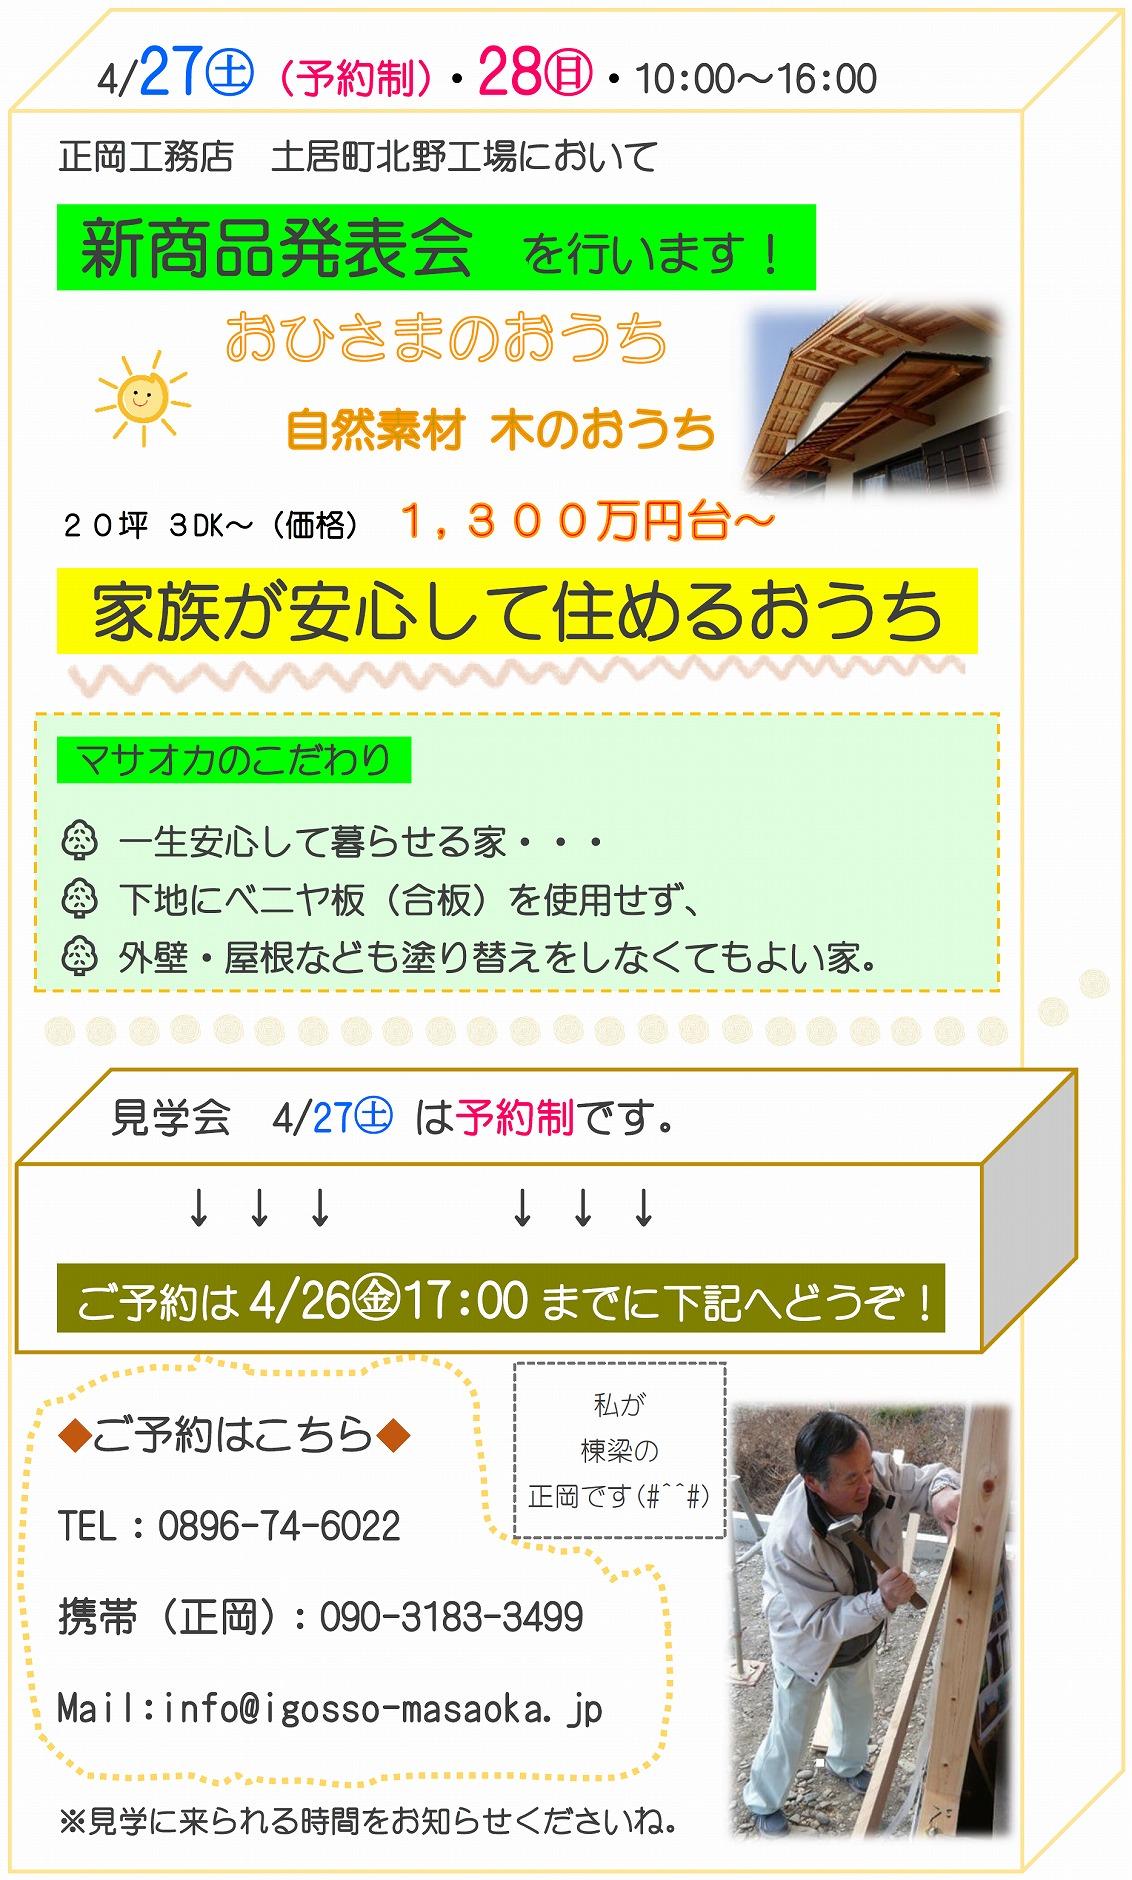 kengakukai_2019.4.27~28.jpg